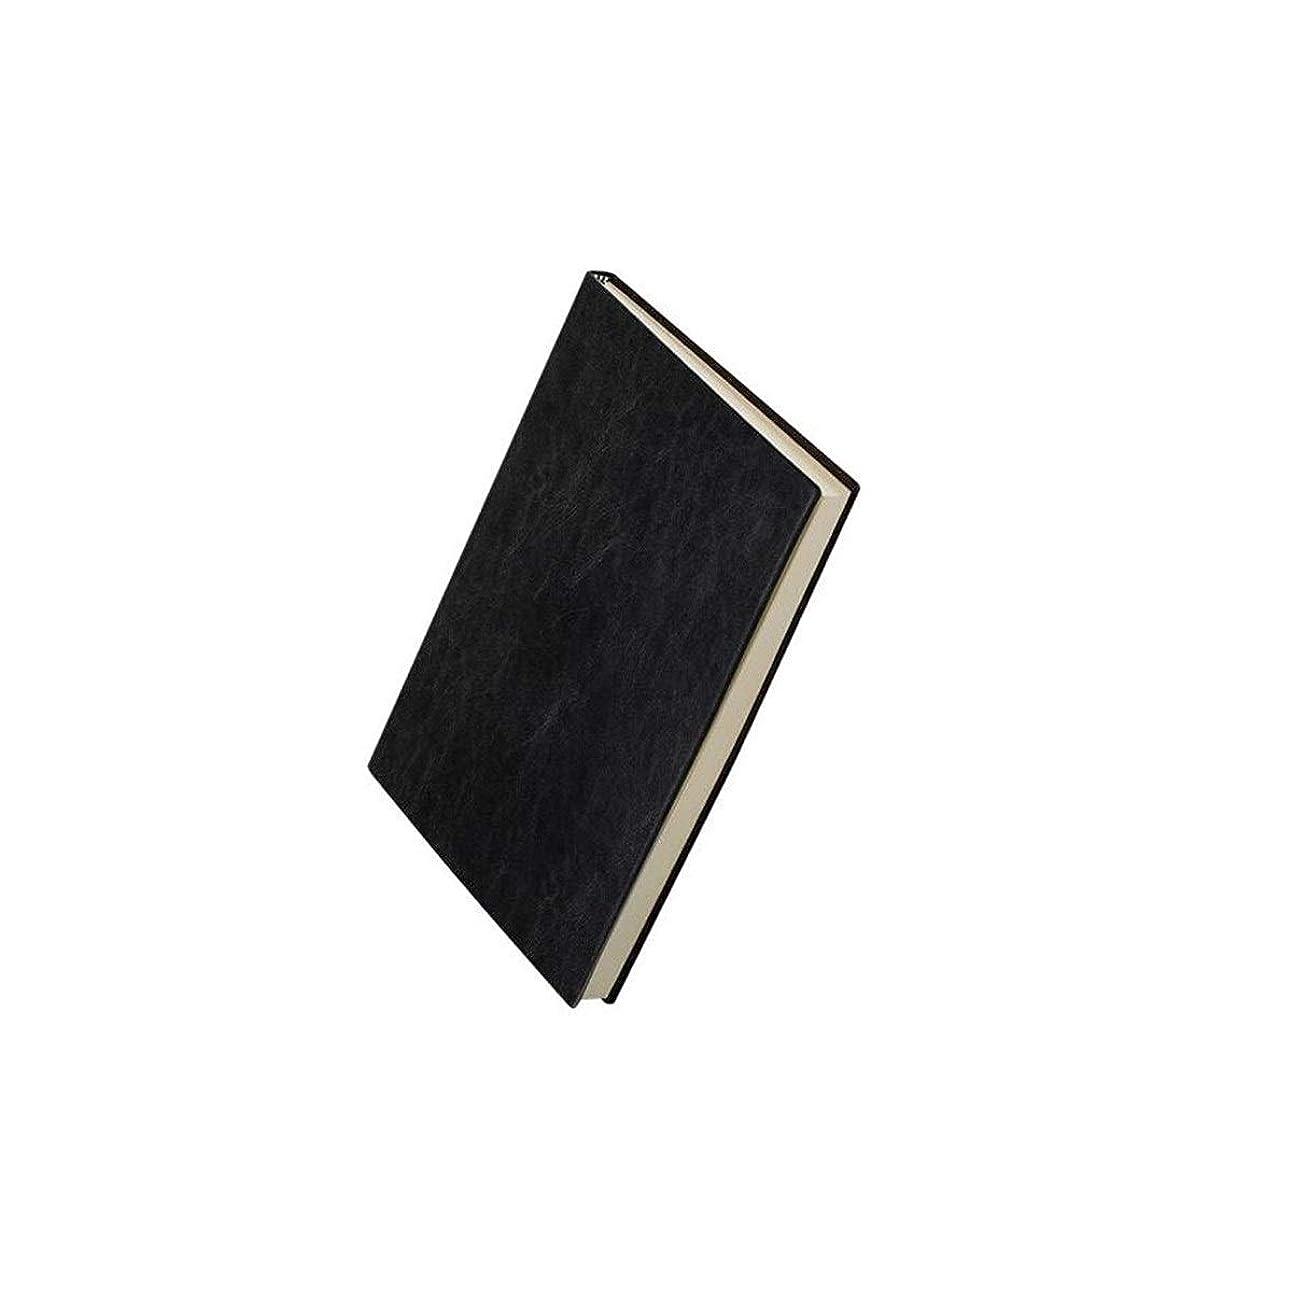 XIONGHAIZI 25k320ページビジネスレザーノートブック、オフィスノートブックノートブック、ブラック、ブラウン、ブルー (Color : Black)